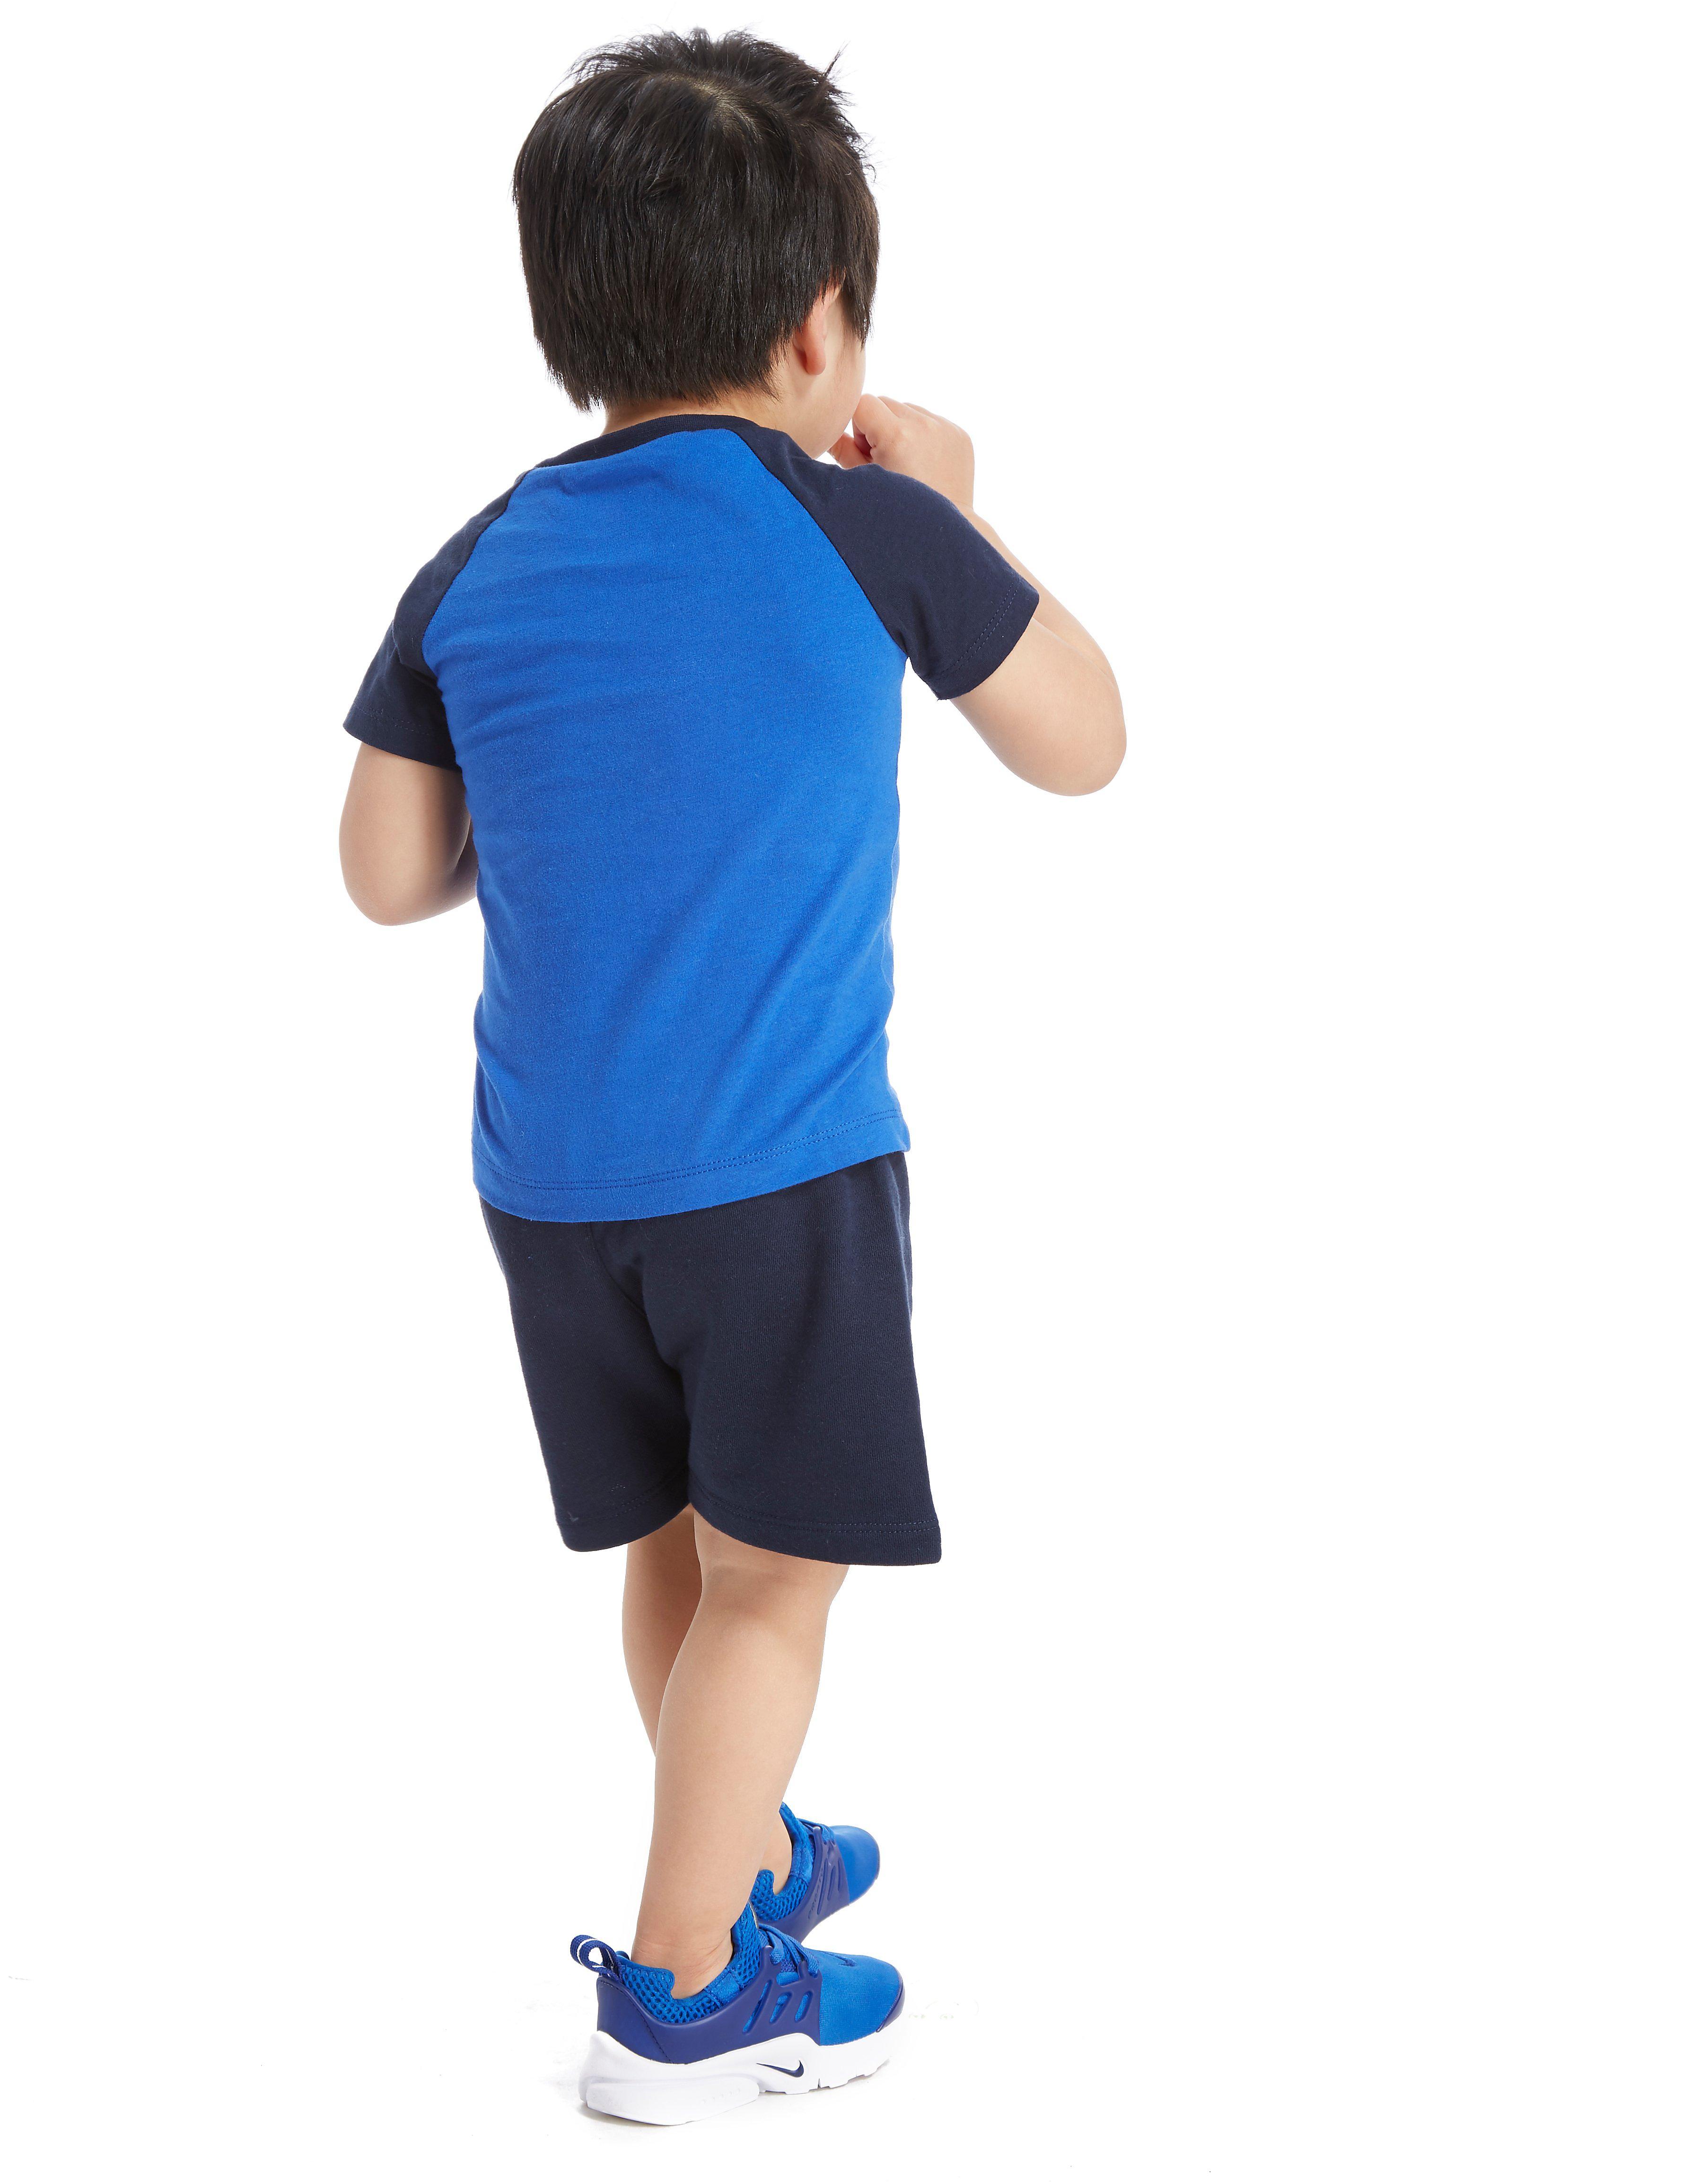 Nike T-Shirt/Shorts Set Baby's